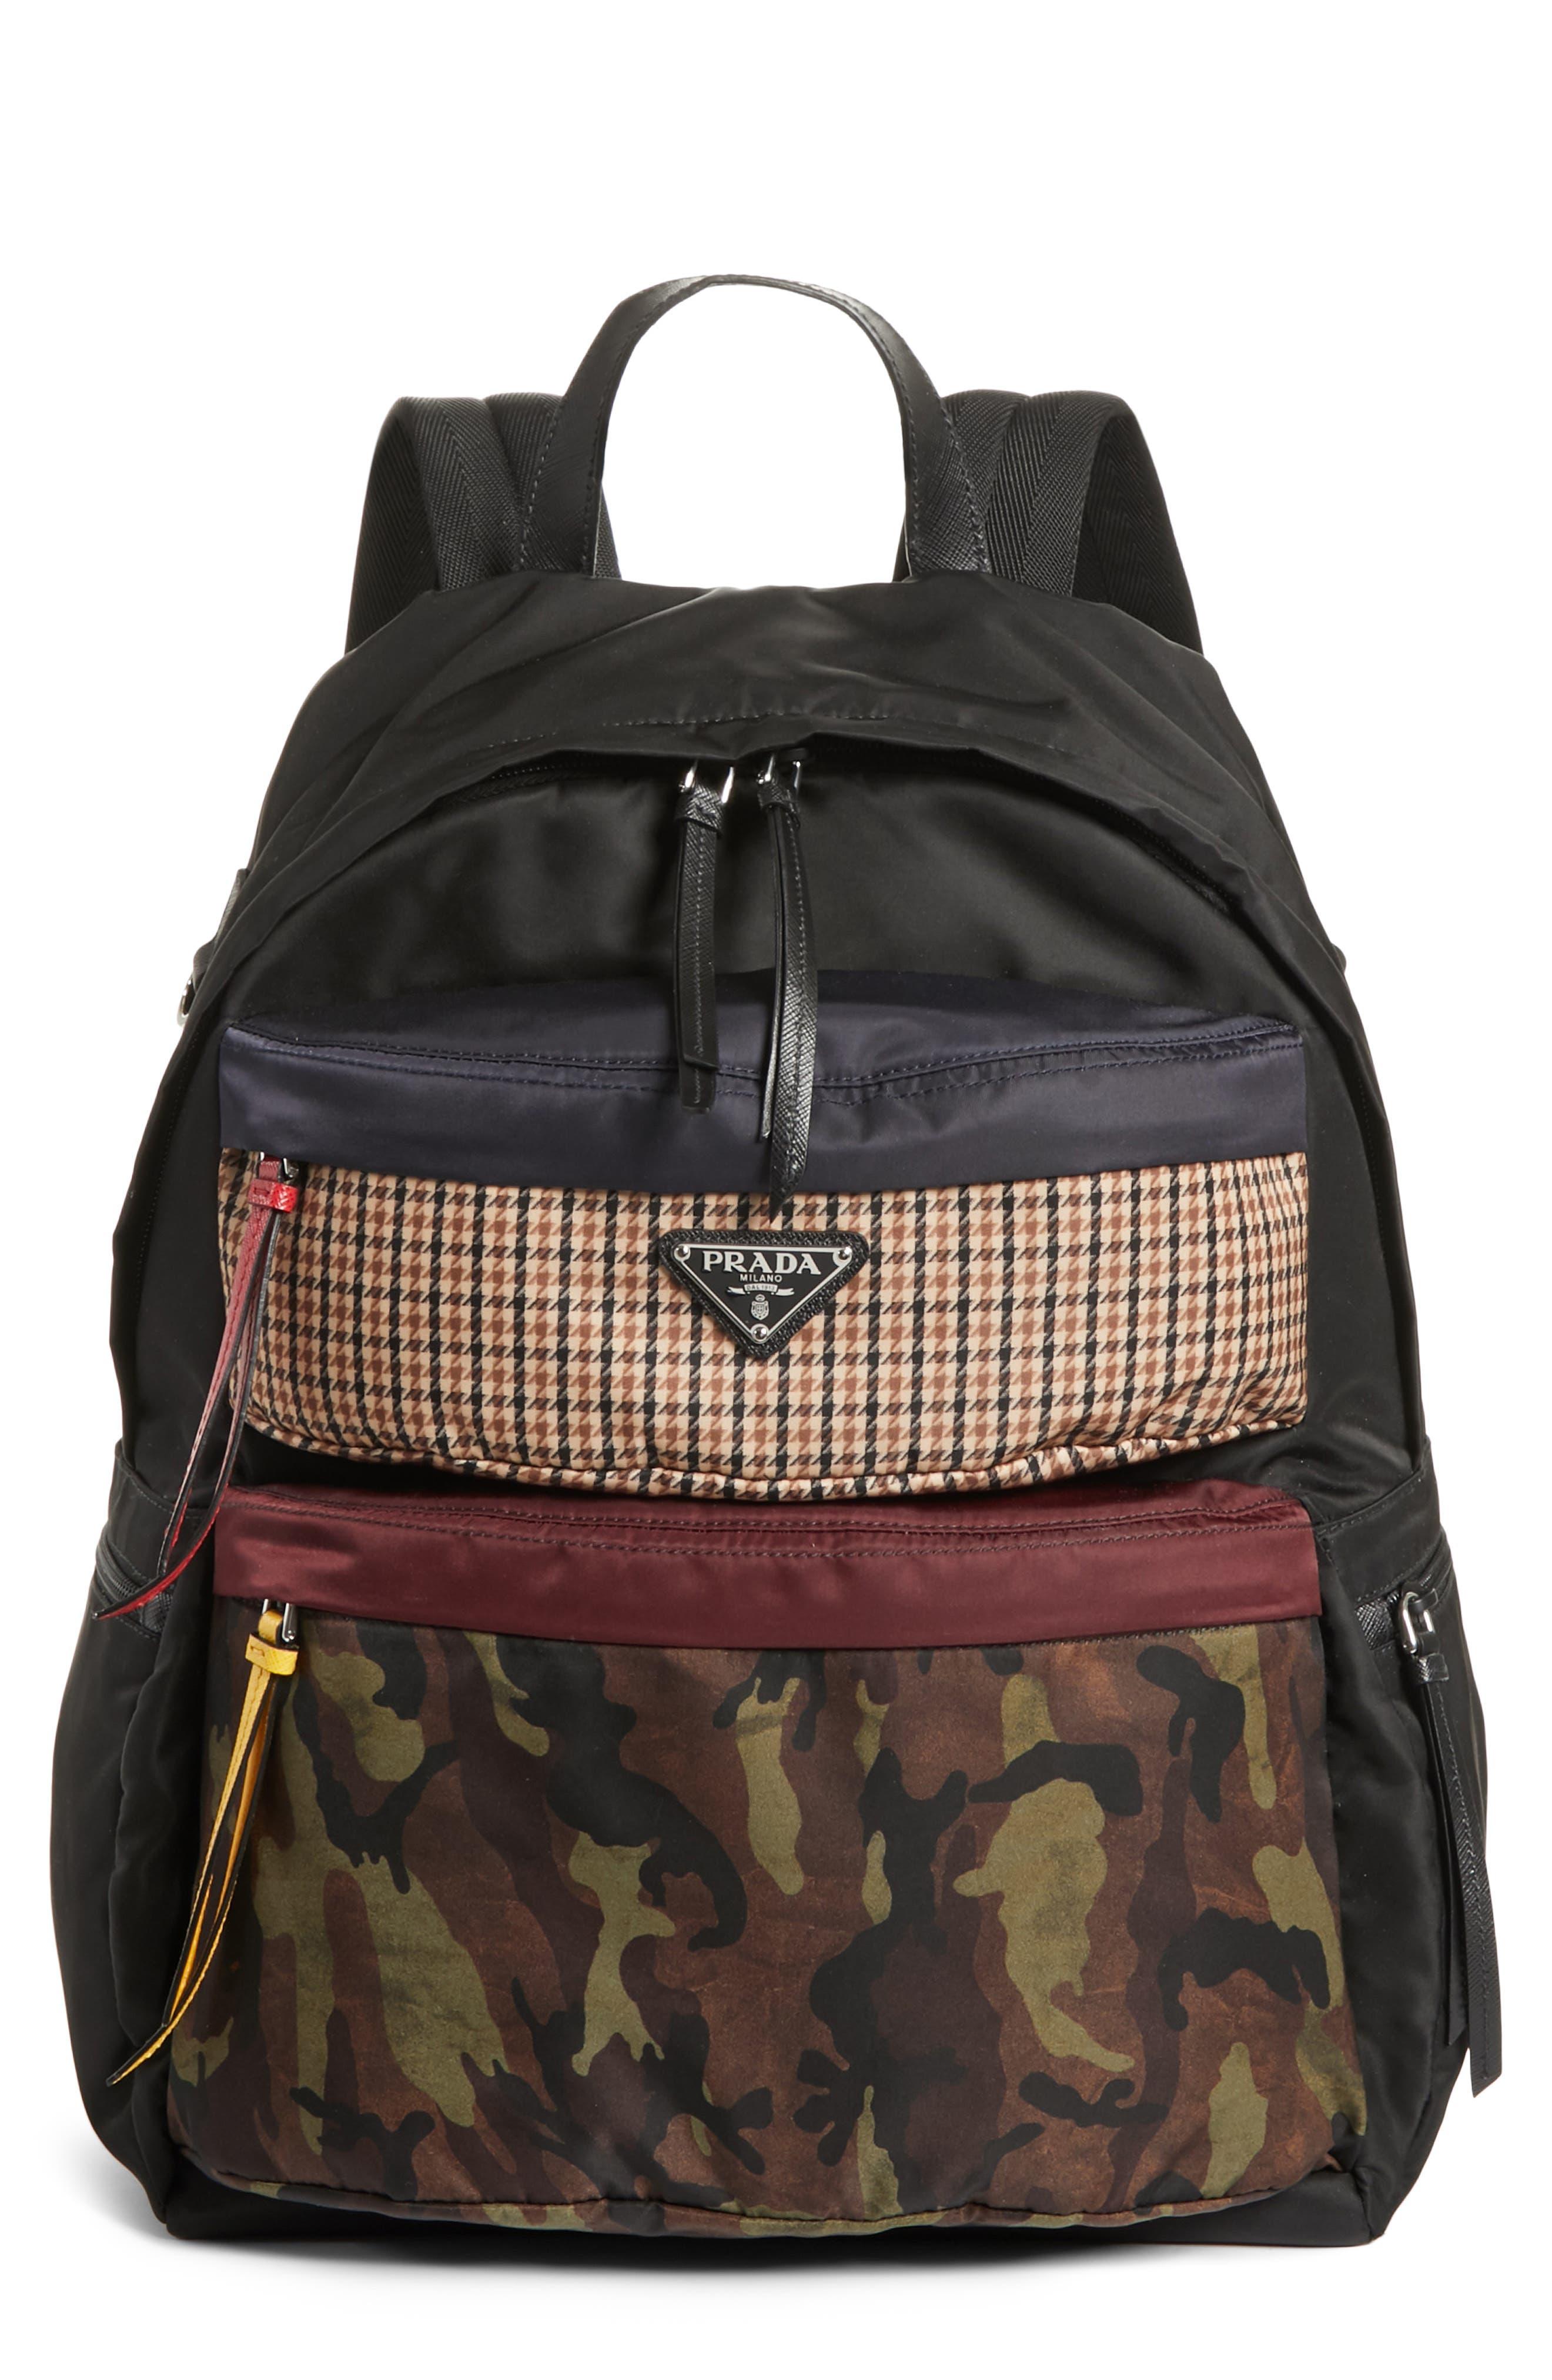 Tessuto Camo Patch Nylon Backpack,                             Main thumbnail 1, color,                             CAMO